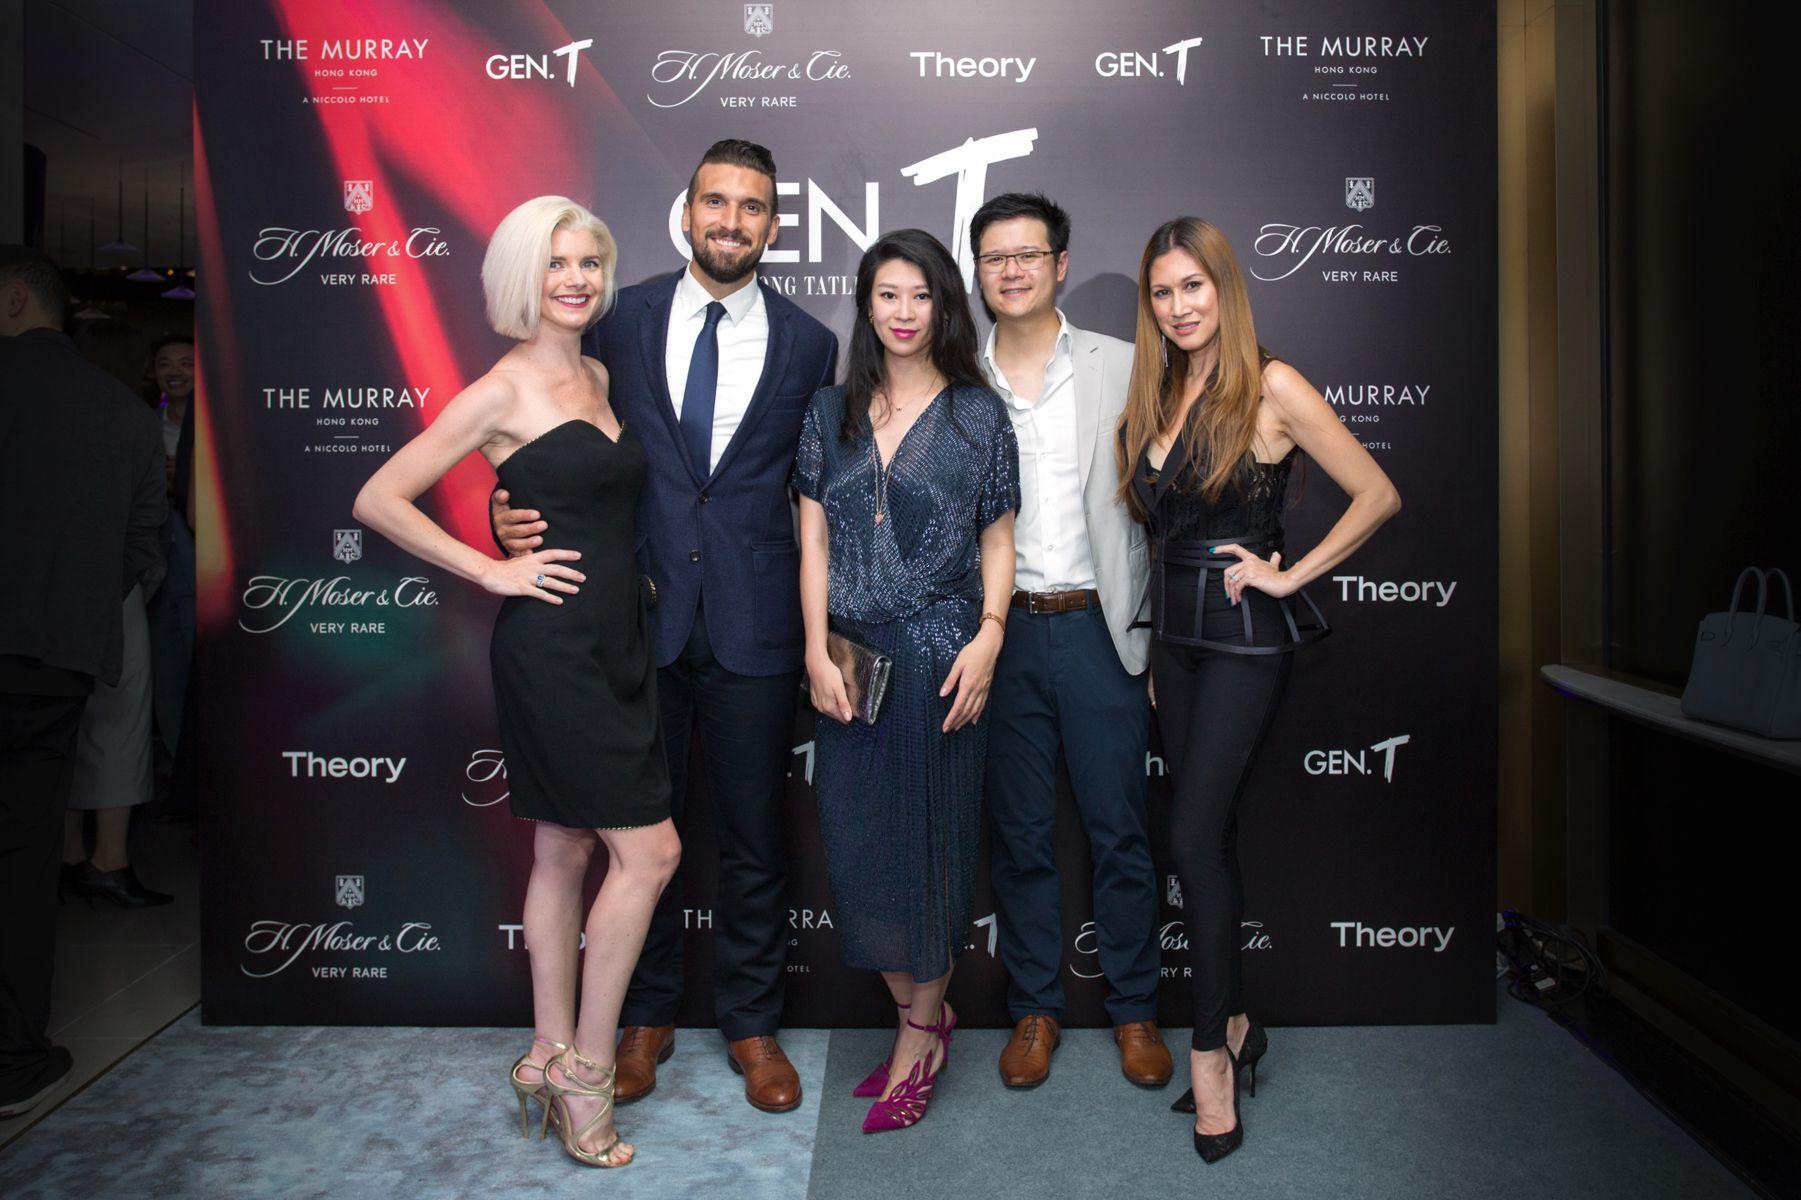 Katherine Bisagni, Alessandri Bisagni, Christy Liang, Benjamin Liang, Anna Treier